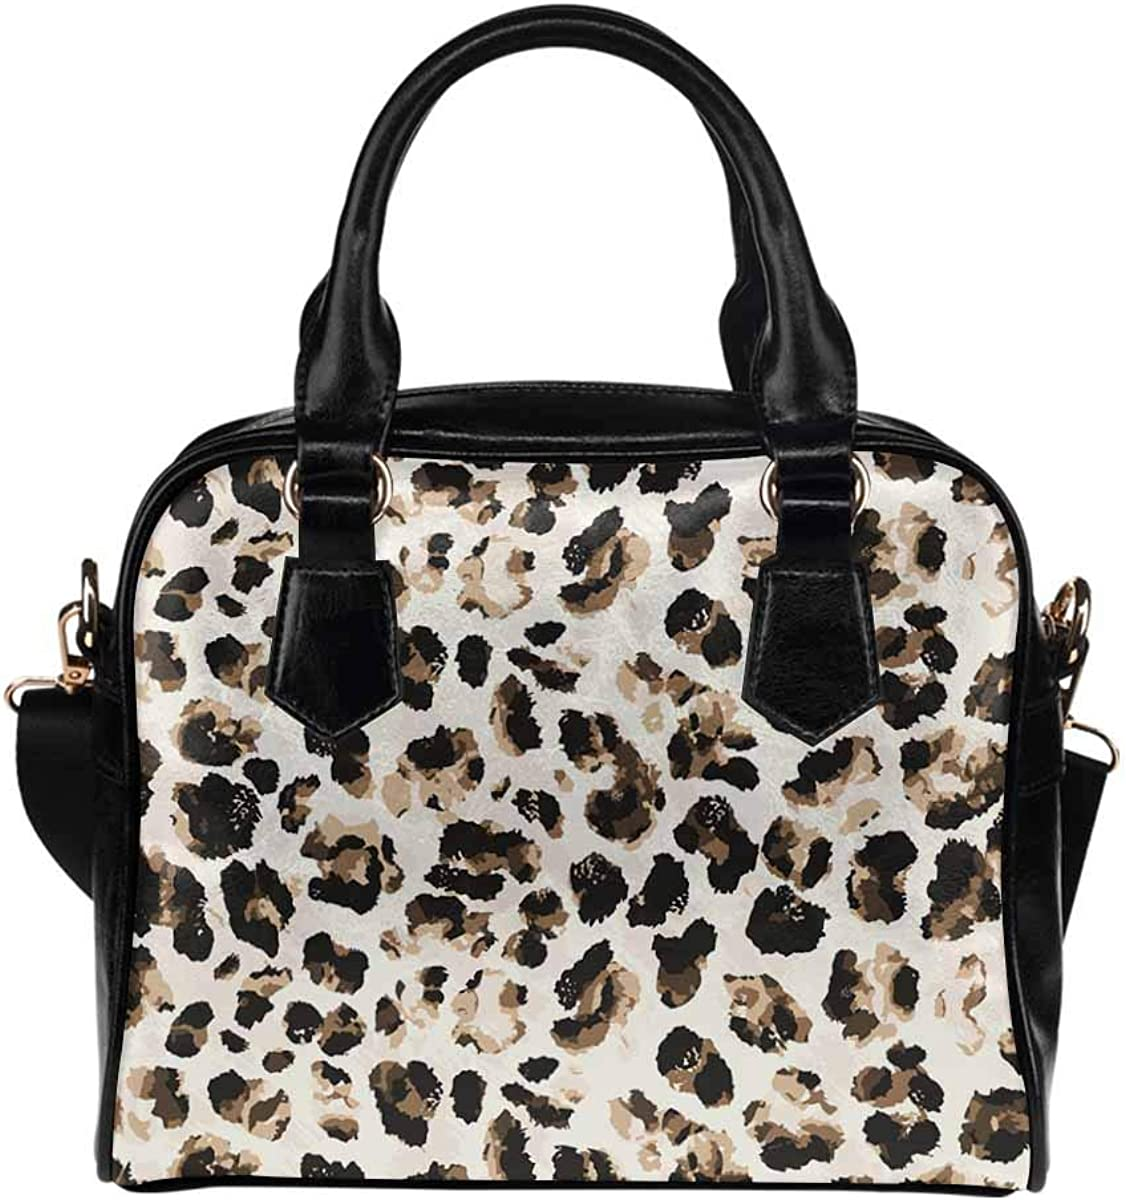 Watercolr Sea Turtles PU Leather Purse Handbags Shoulder Crossbody Bag for Women Girls